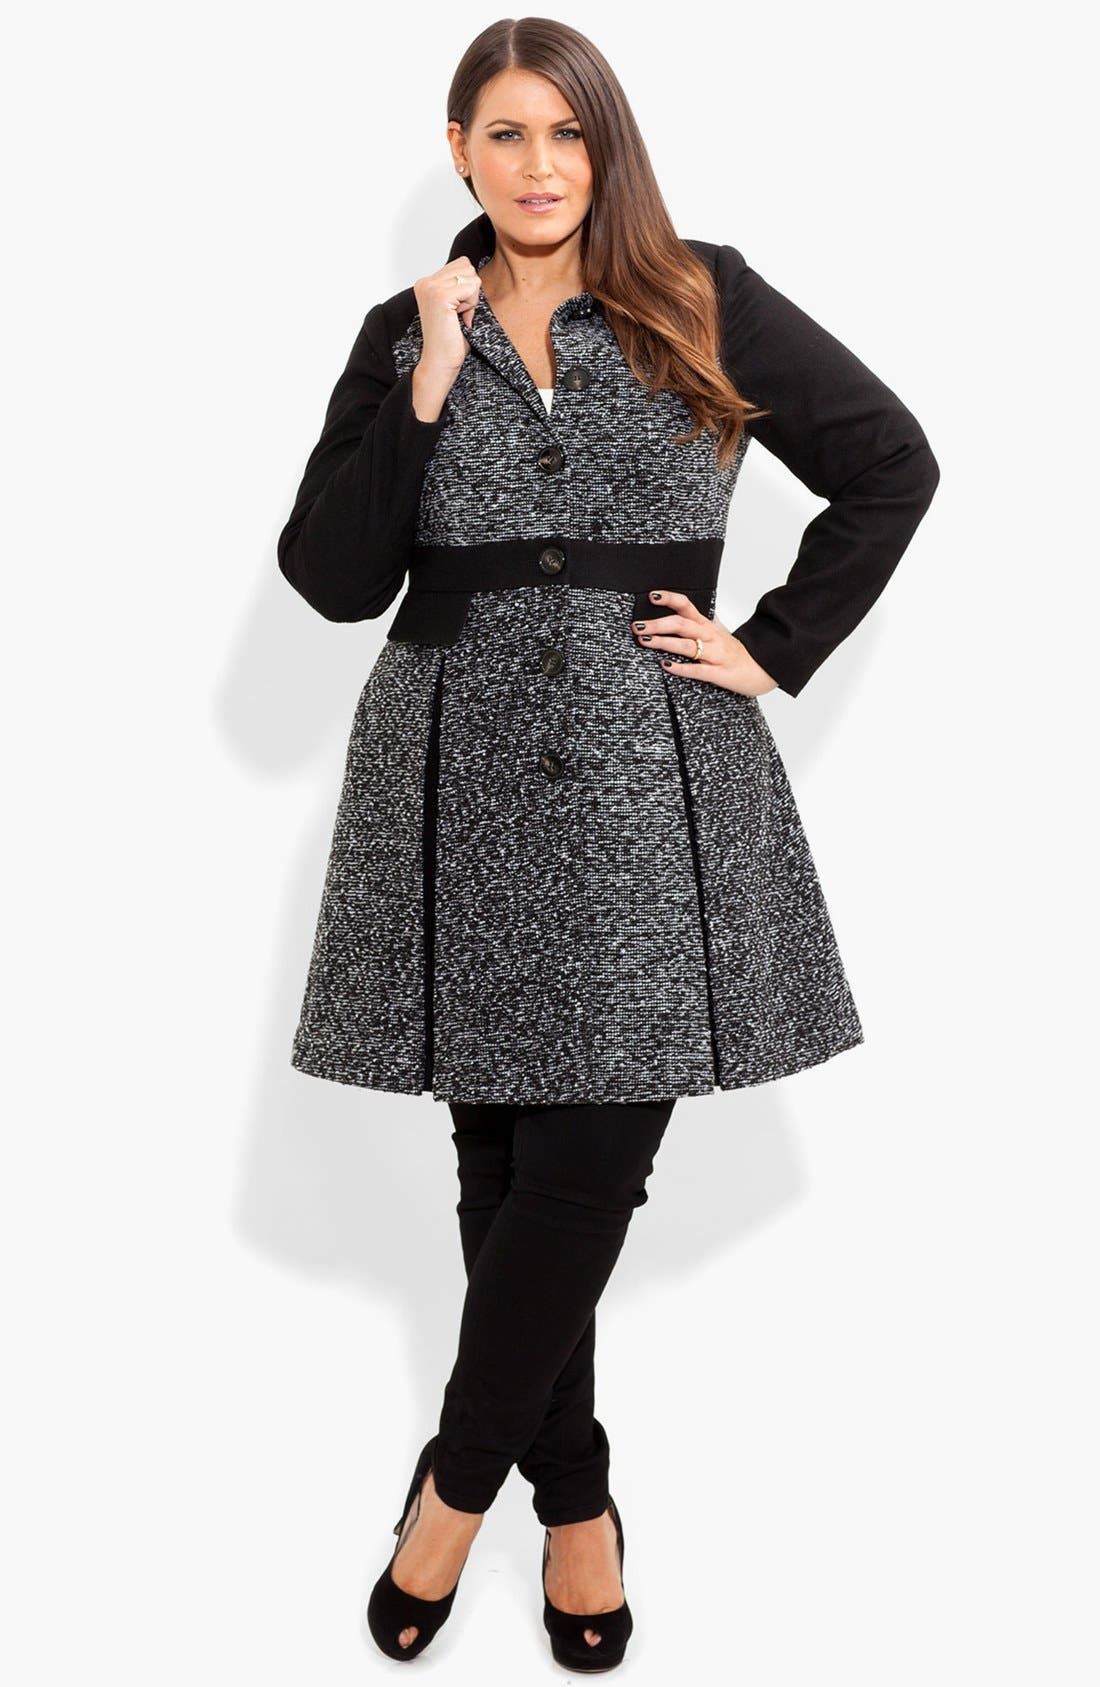 Alternate Image 1 Selected - City Chic Bouclé Fit & Flare Jacket (Plus Size)